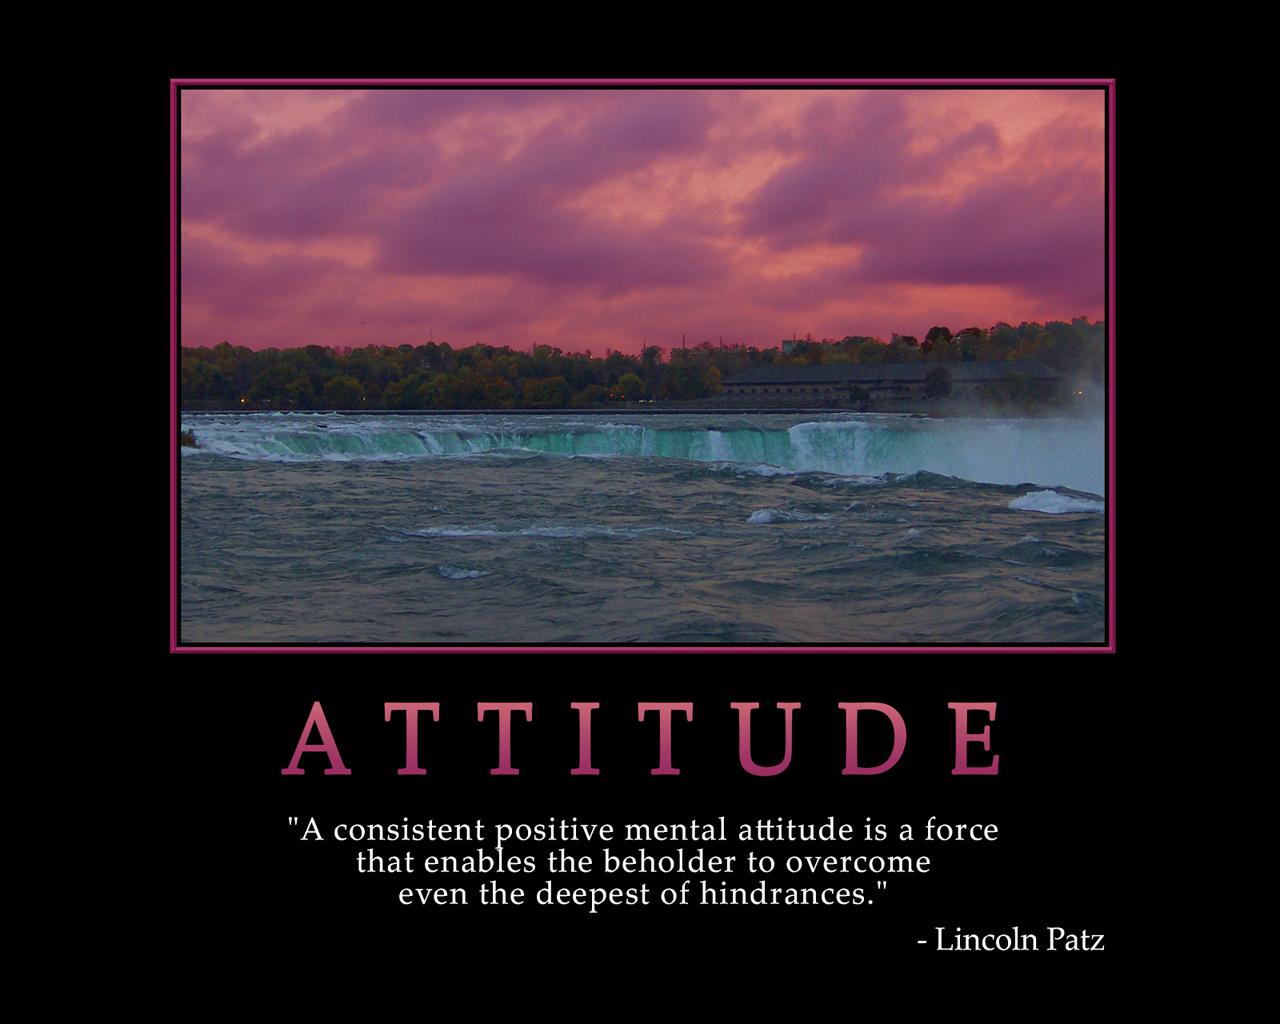 Inspirational Wallpaper on Attitude: A consistent positive mental attitude